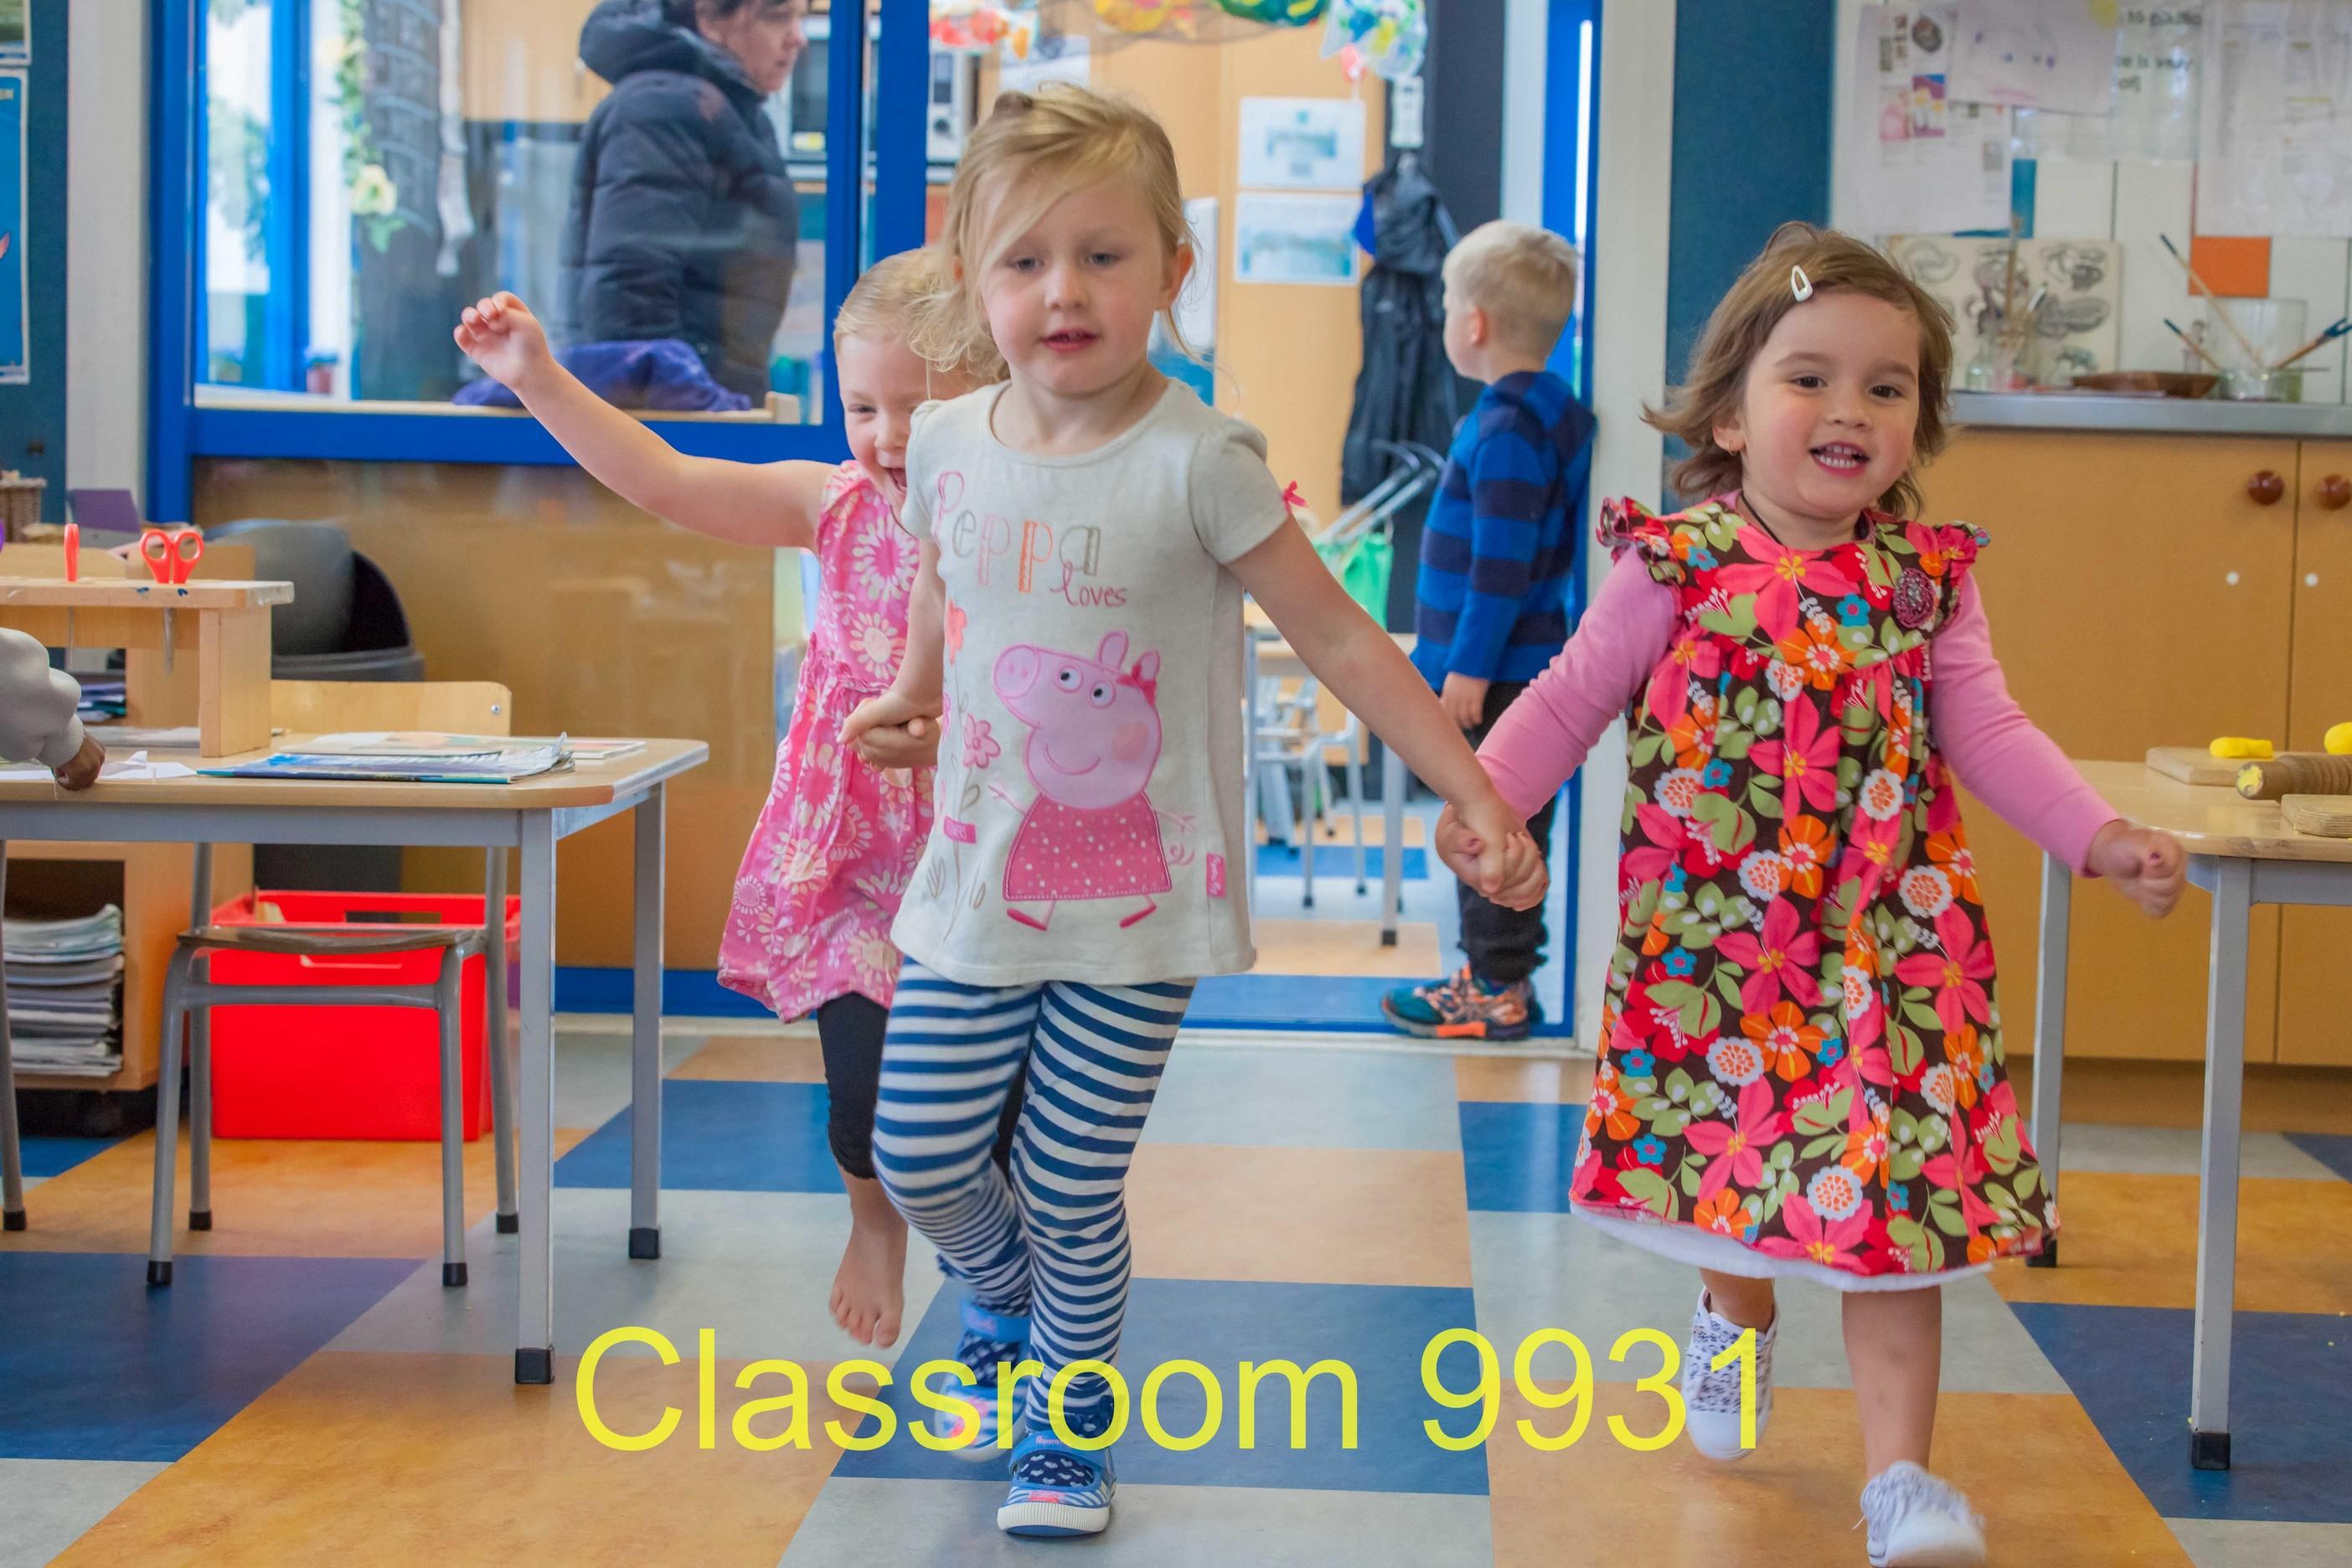 Classroom 9931